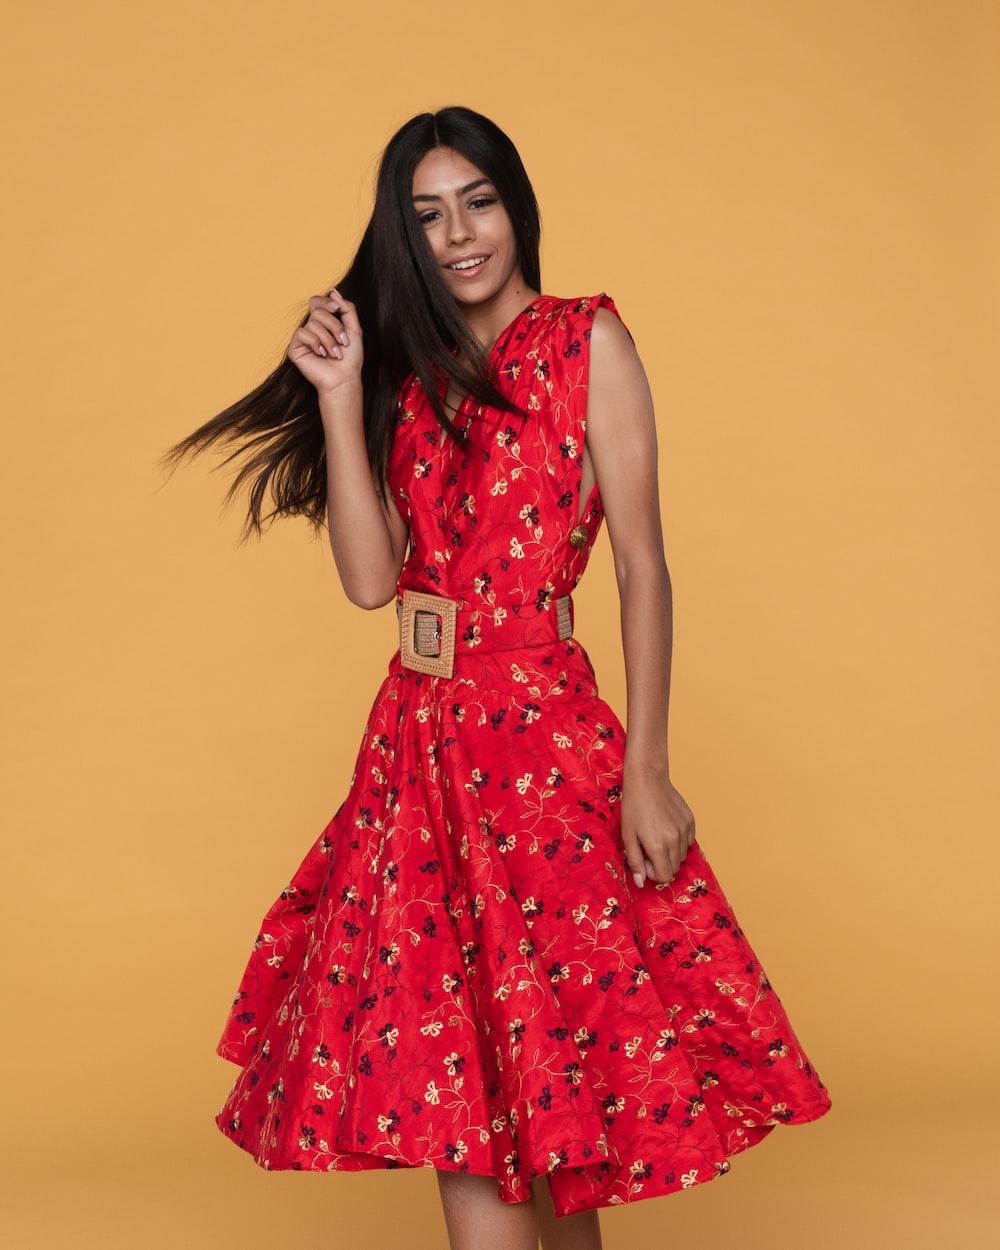 woman wearing red floral sleeveless midi dress